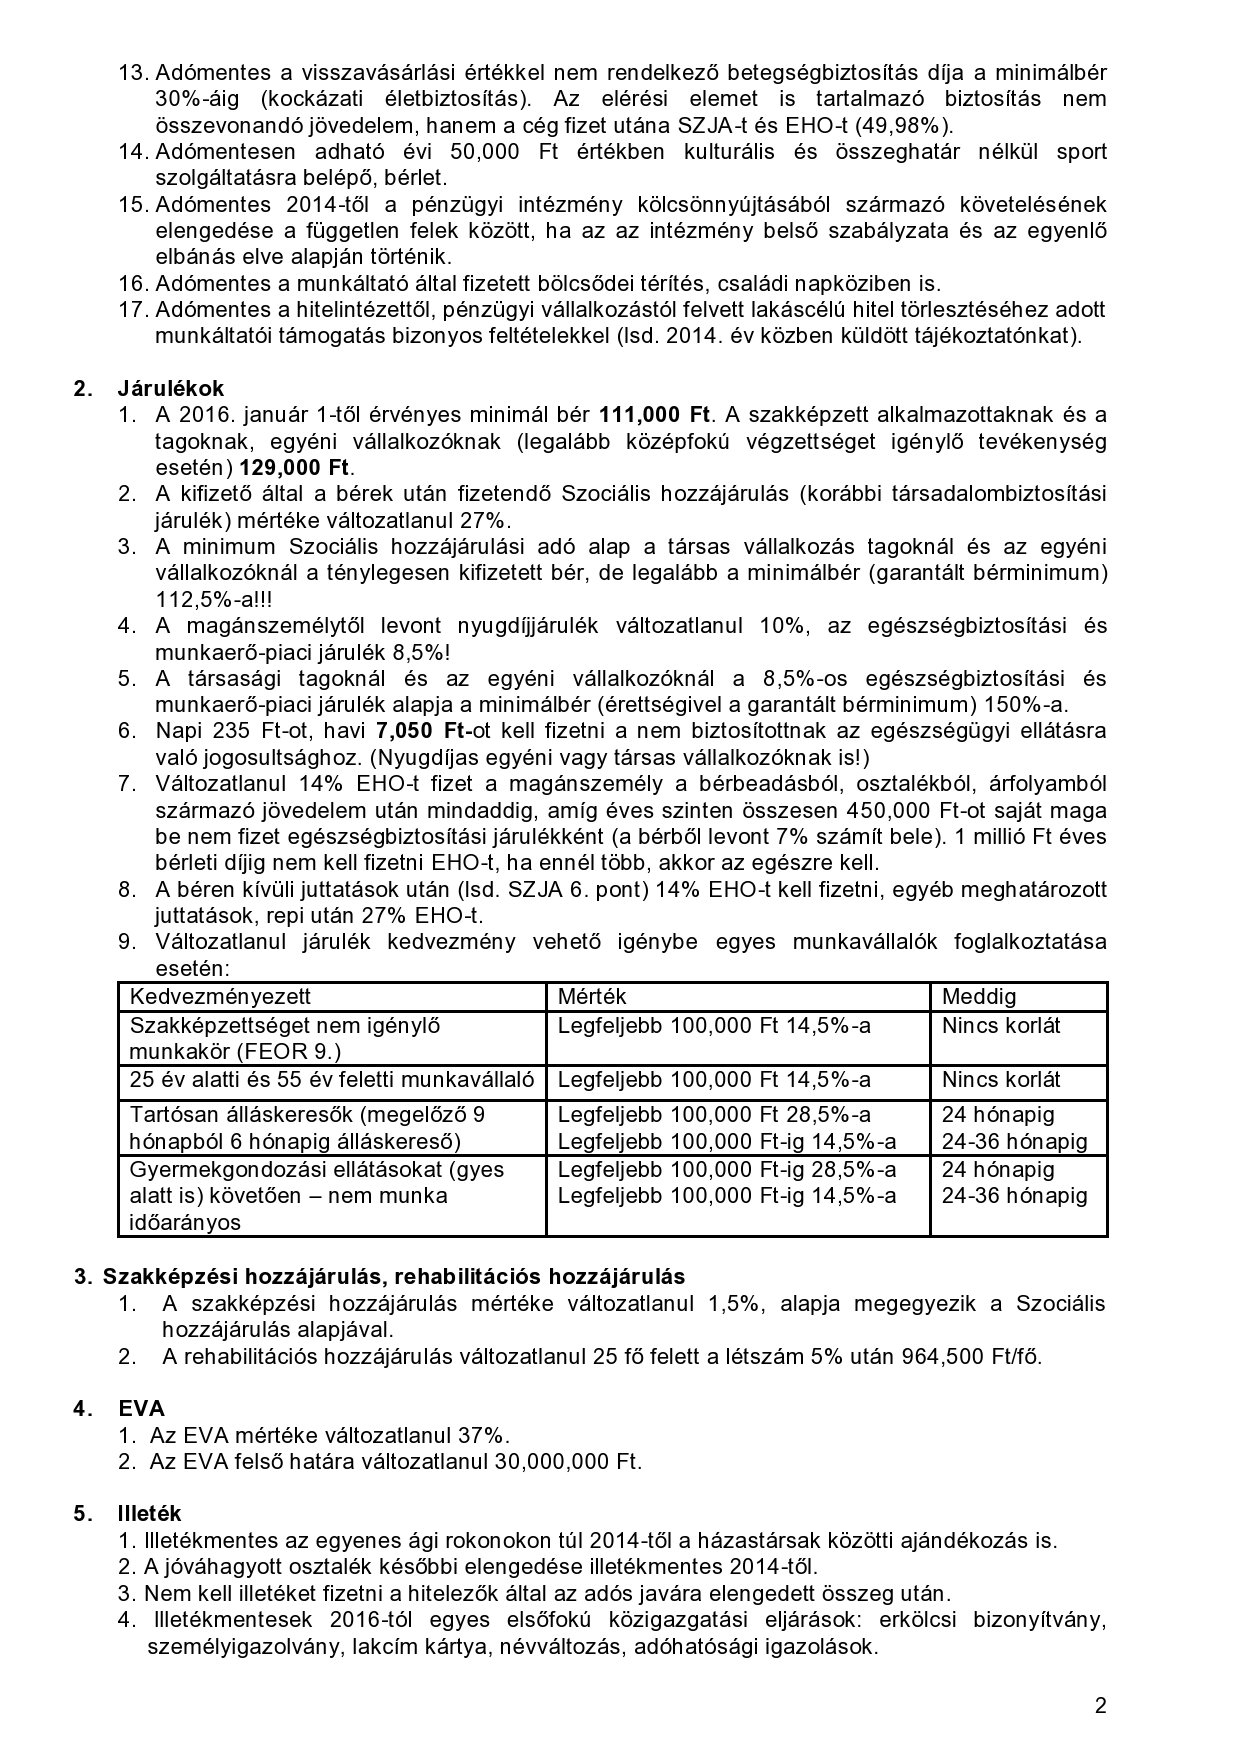 cegek_2016_tajekoztato_20151227-page0002.jpg